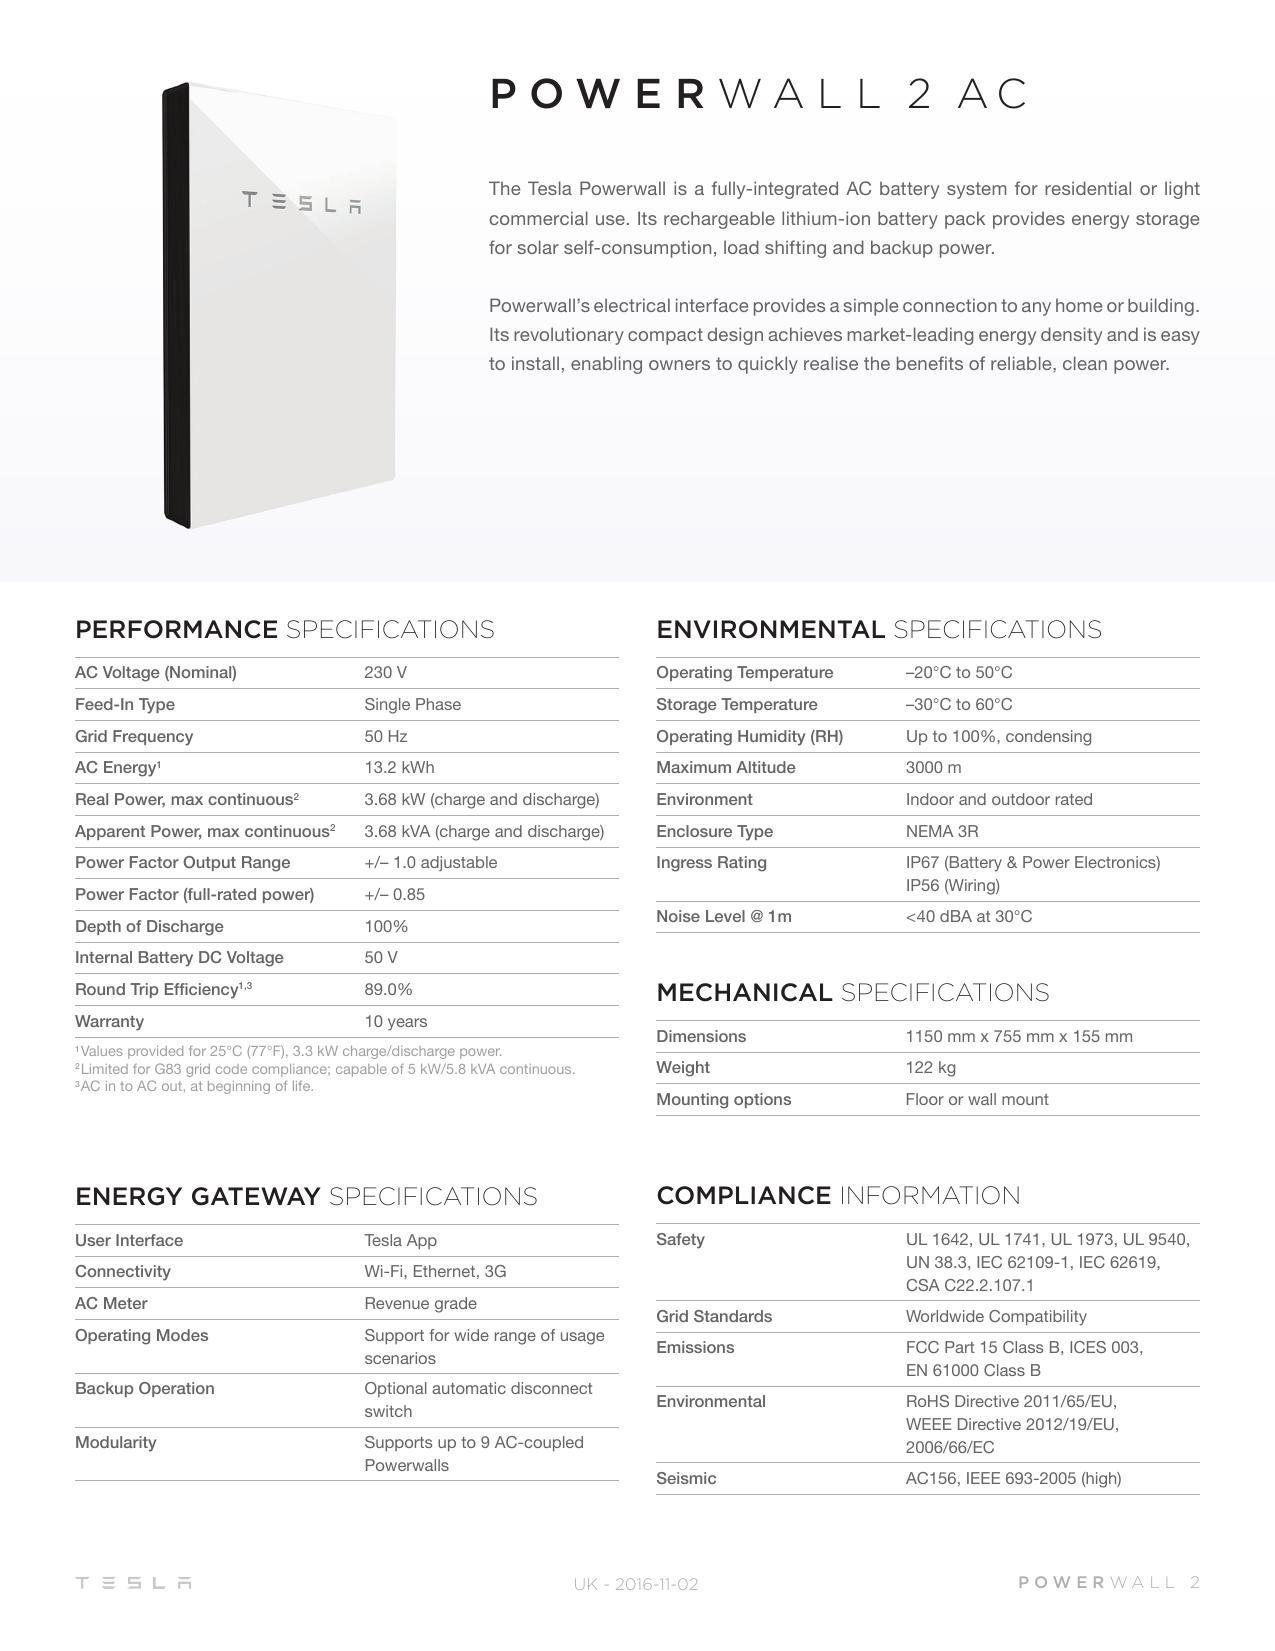 Powerwall 2 AC Datasheet   manualzz com